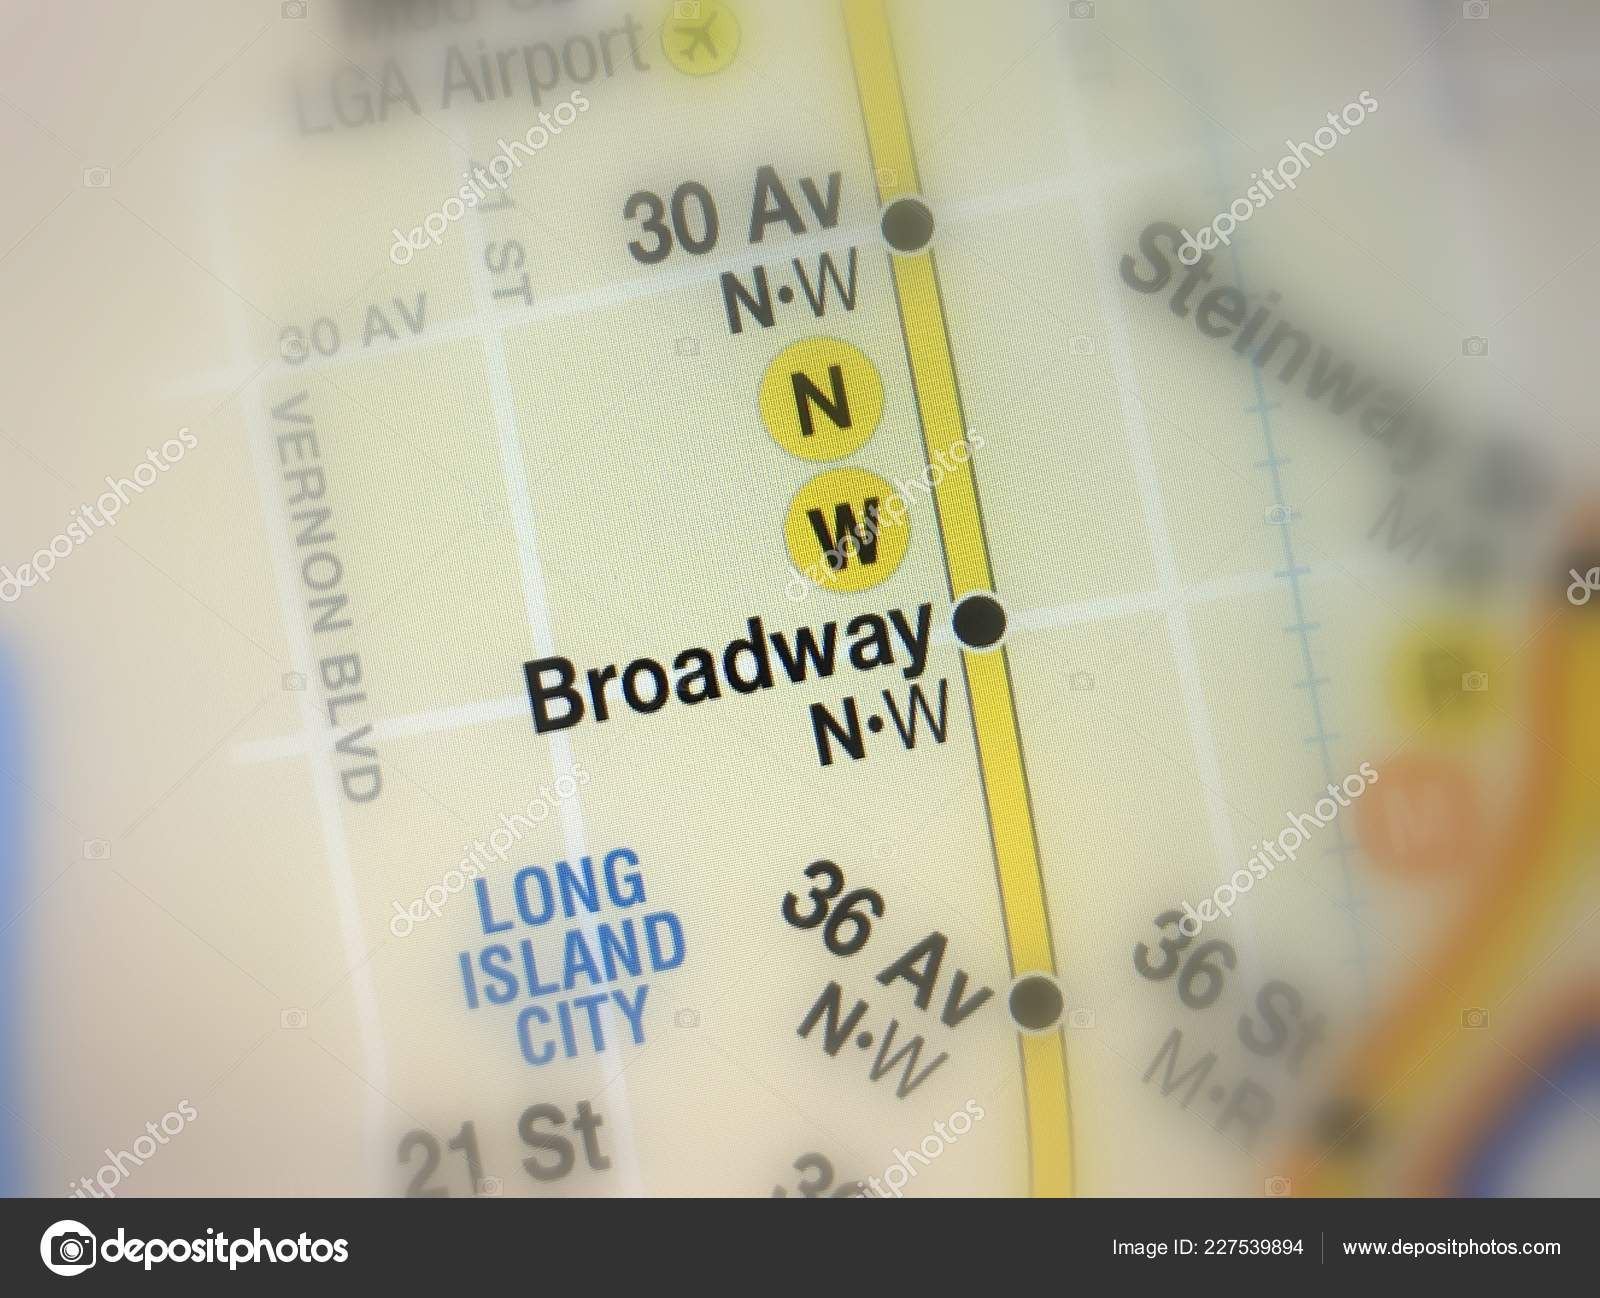 Broadway Subway Map.Amsterdam Netherlands November 2018 Map Broadway Subway Metro